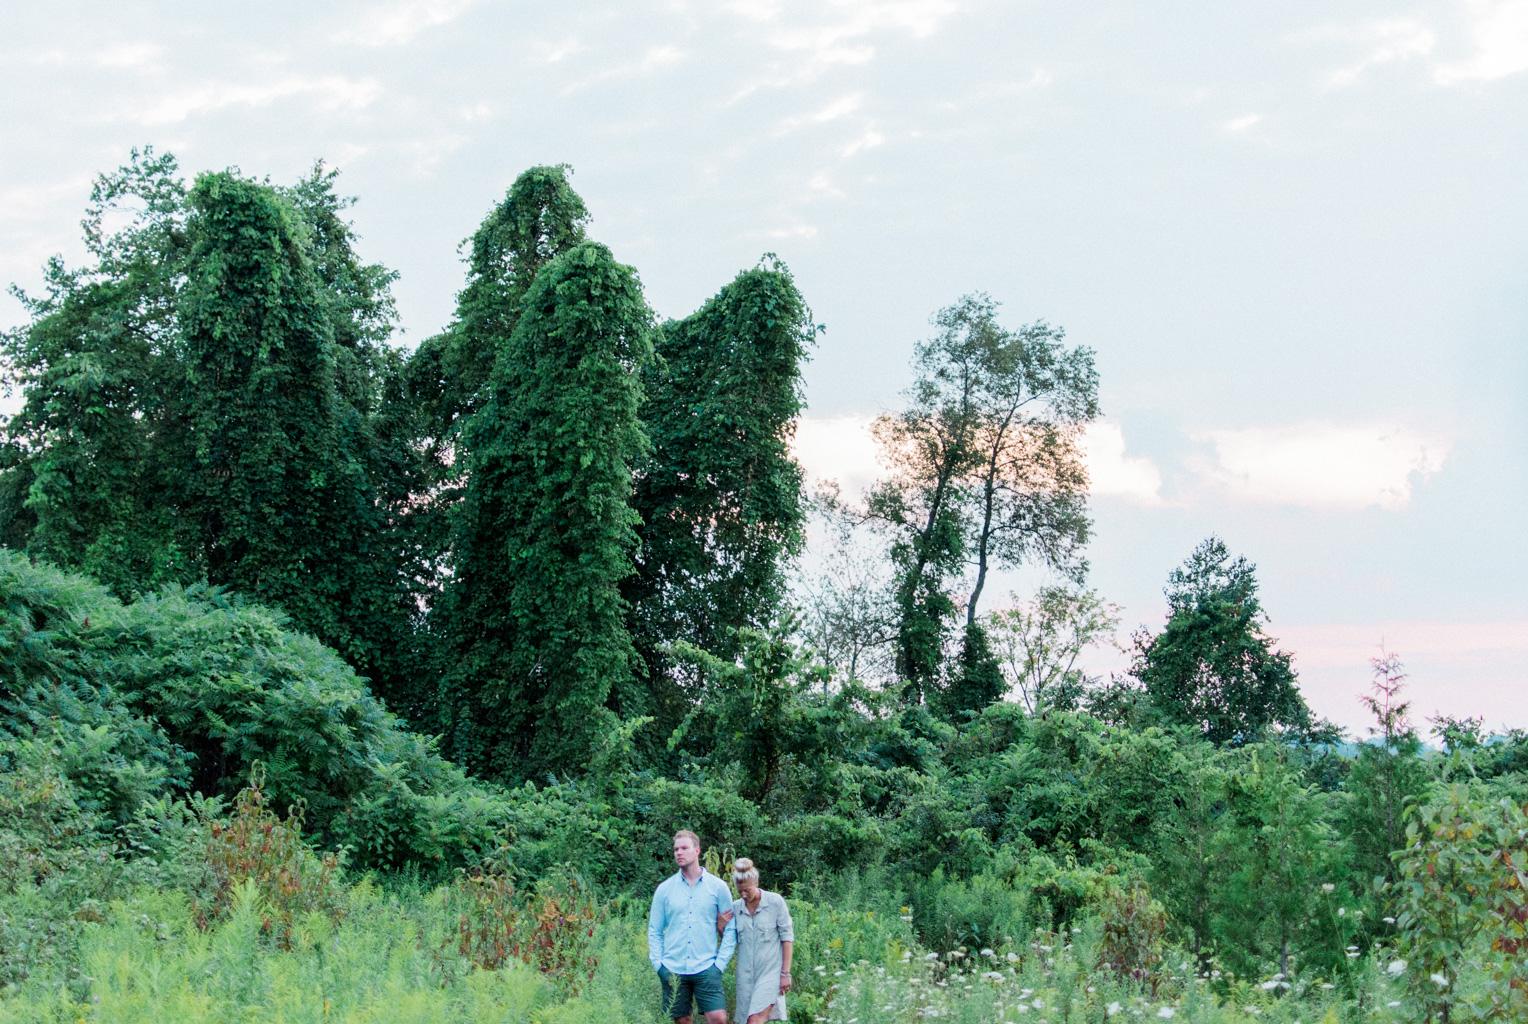 kawartha-lakes-engagement-toronto-film-photographer-52